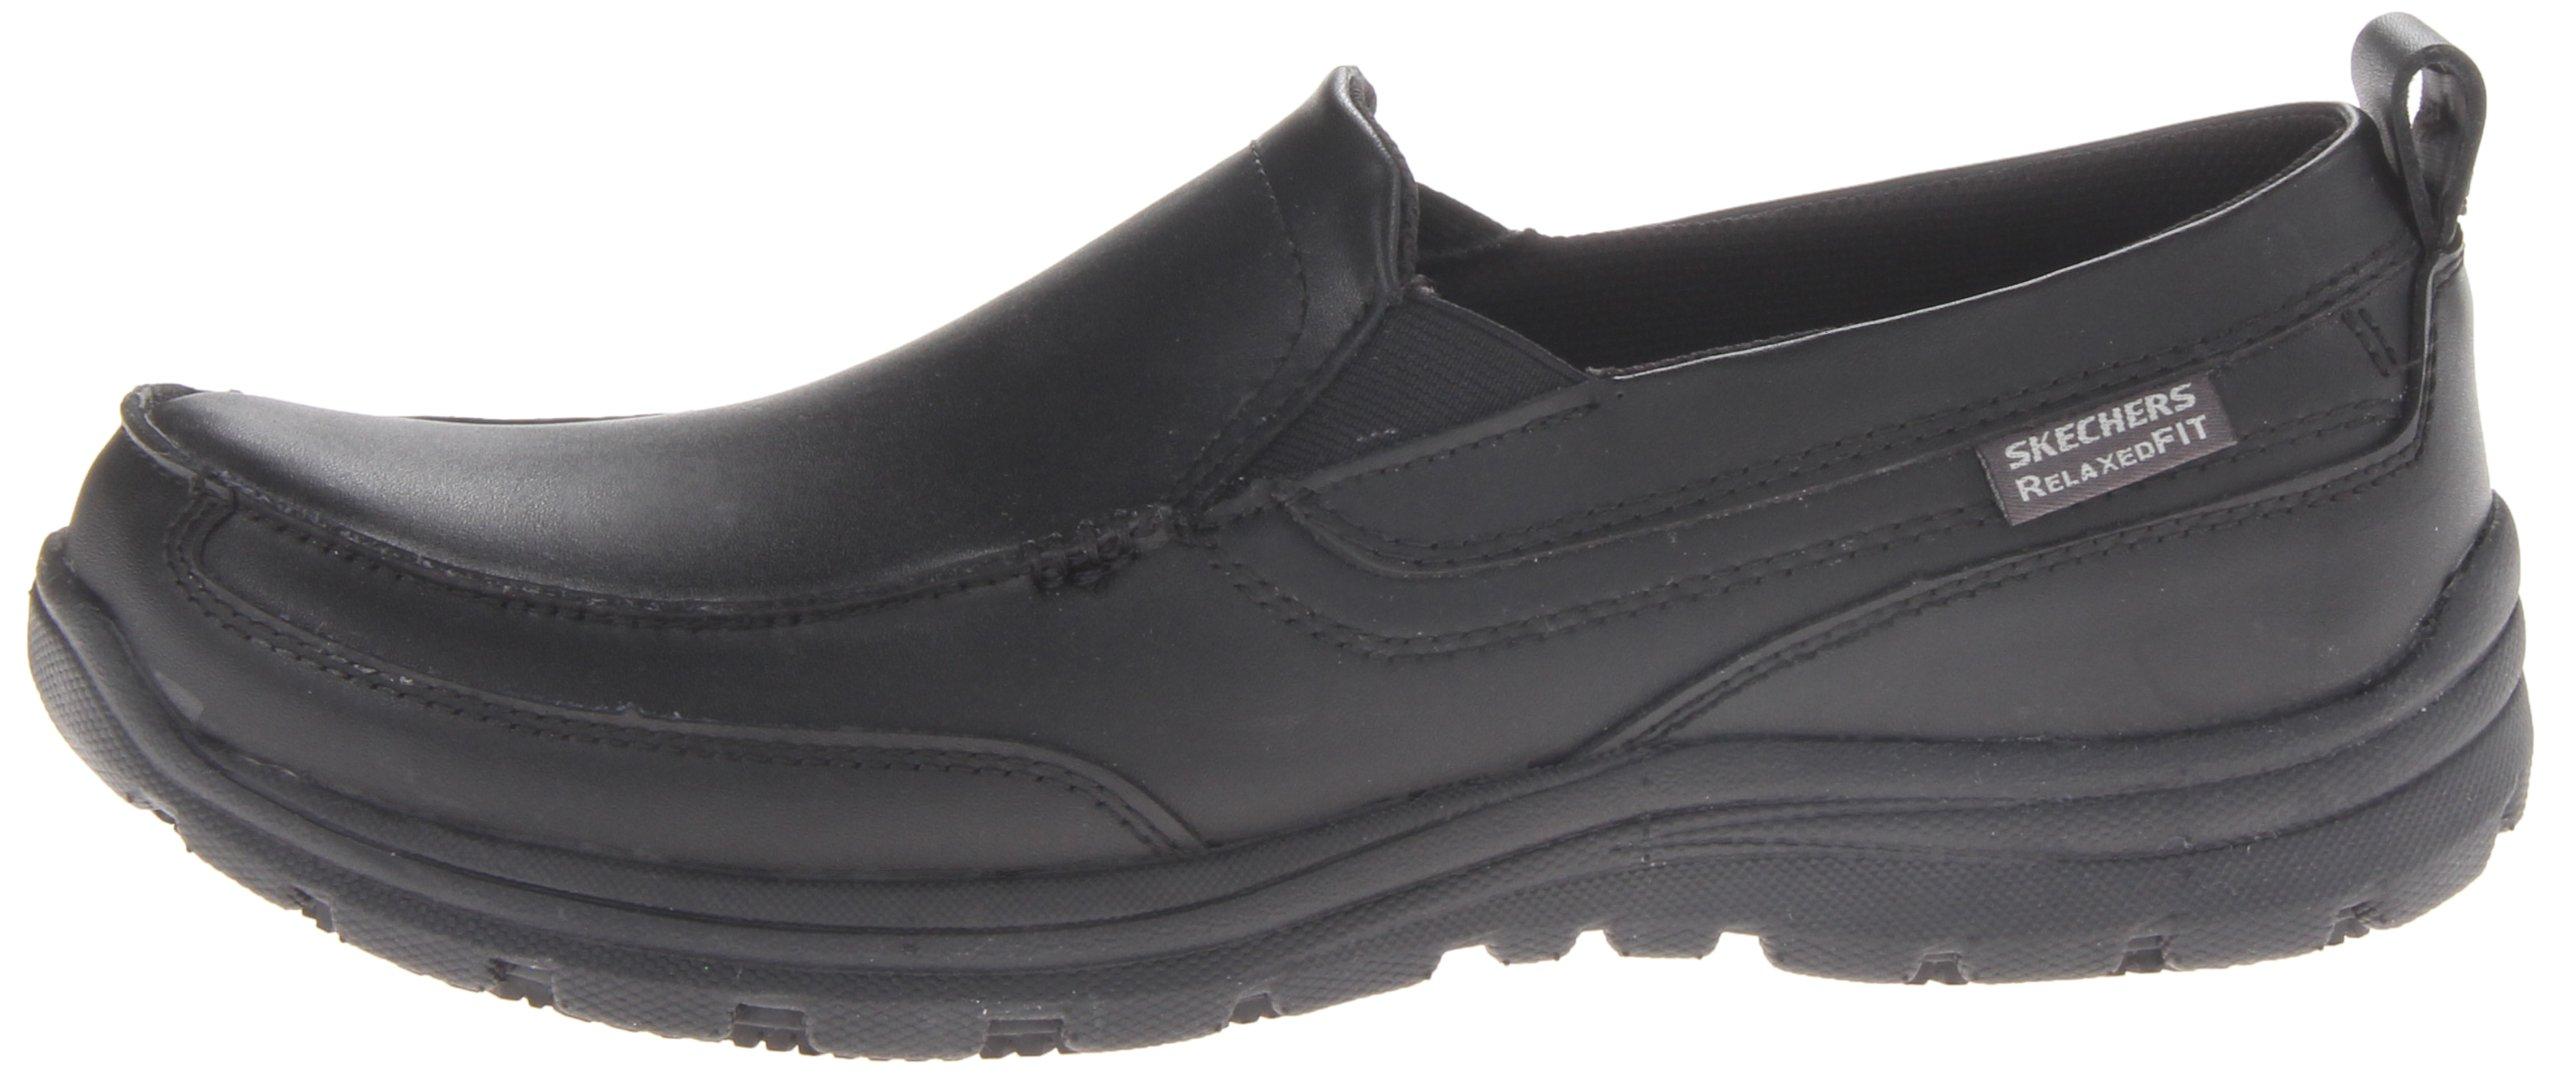 Skechers for Work Men's Hobbes Relaxed Fit Slip Resistant Work Shoe, Black, 11.5 M US by Skechers (Image #5)